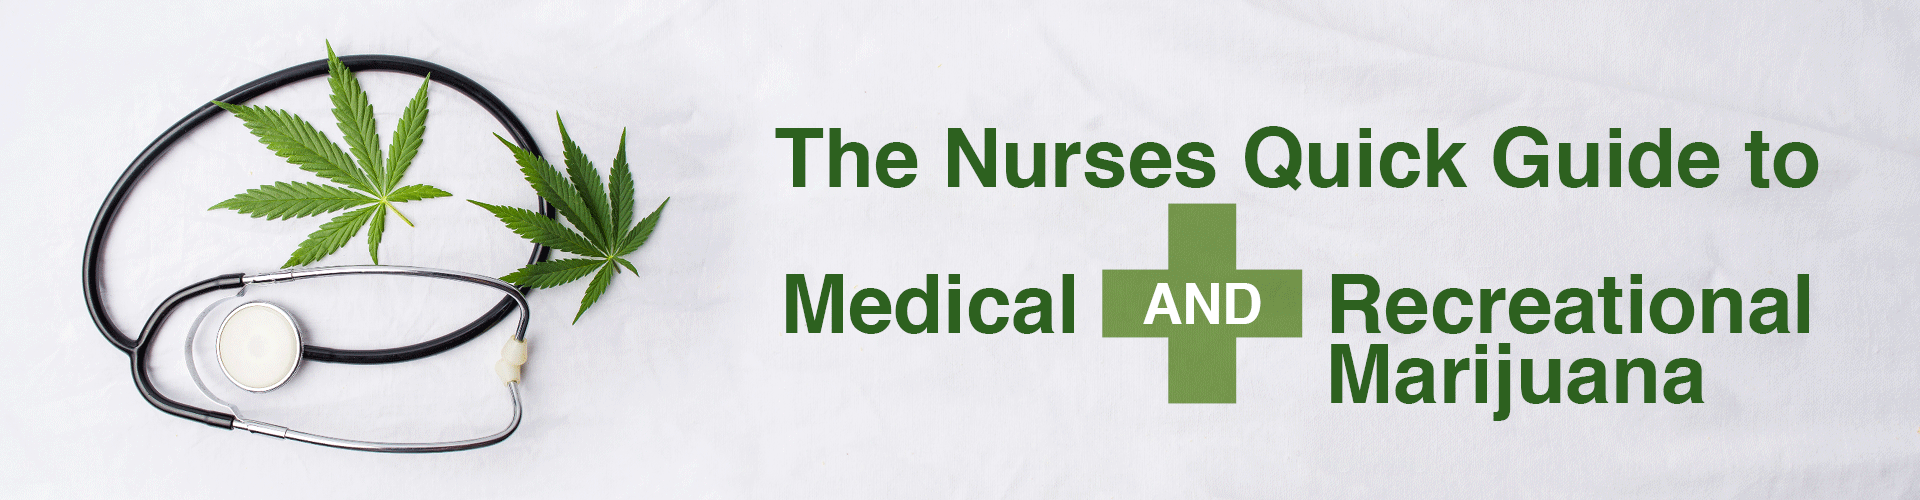 The Nurses Quick Guide to Medical and Recreational Marijuana